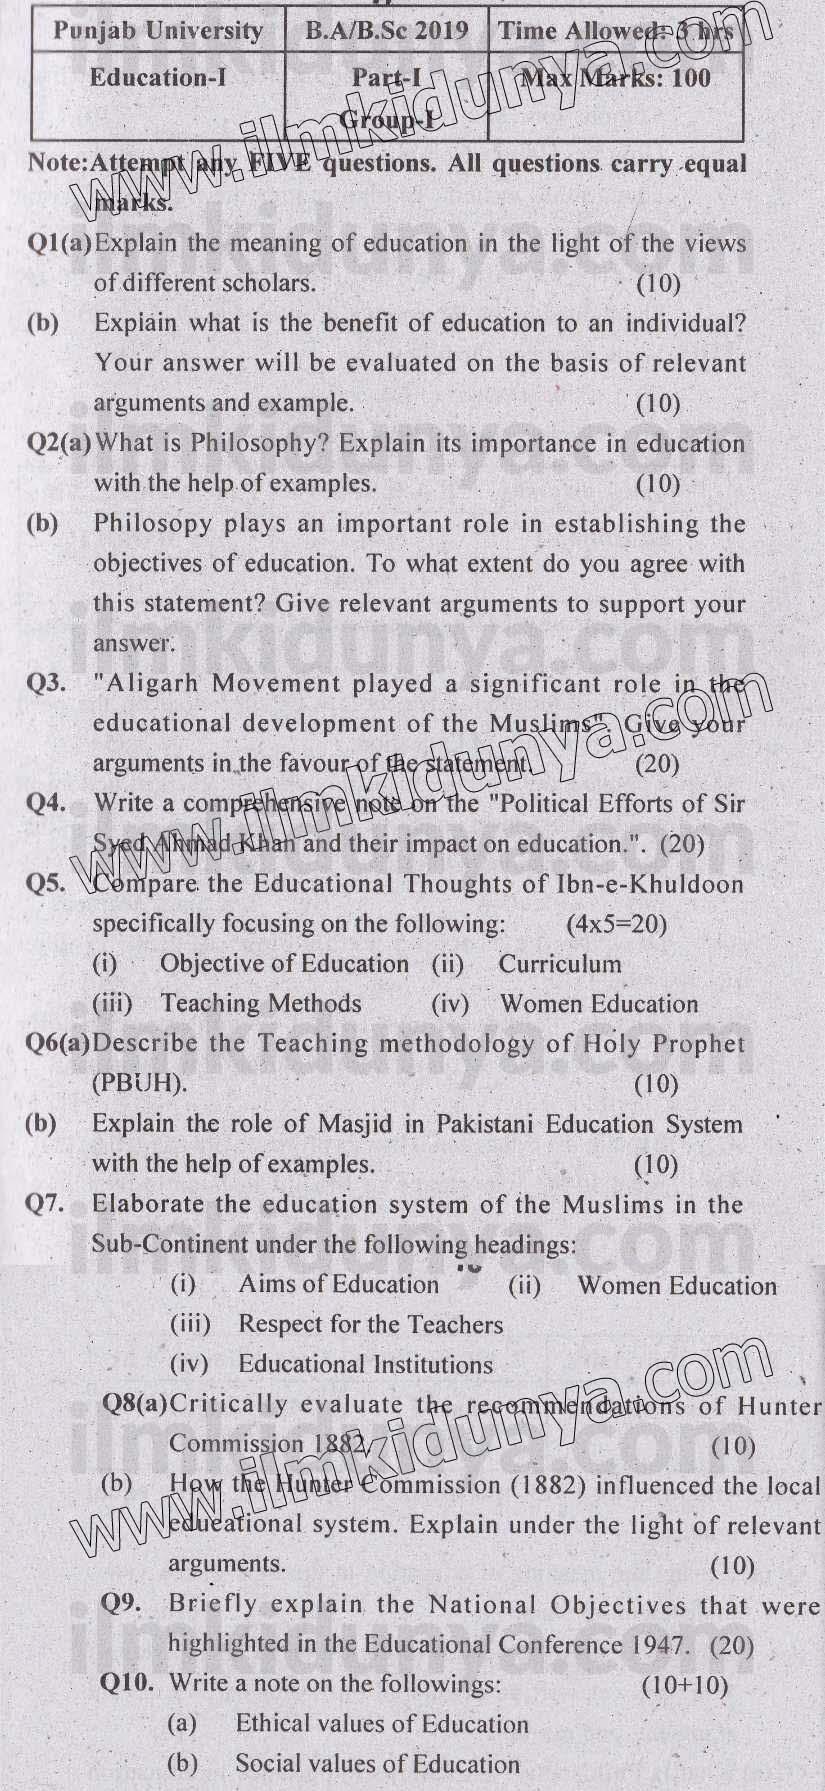 Past Papers 2019 Punjab University B.A Part 1 Education I